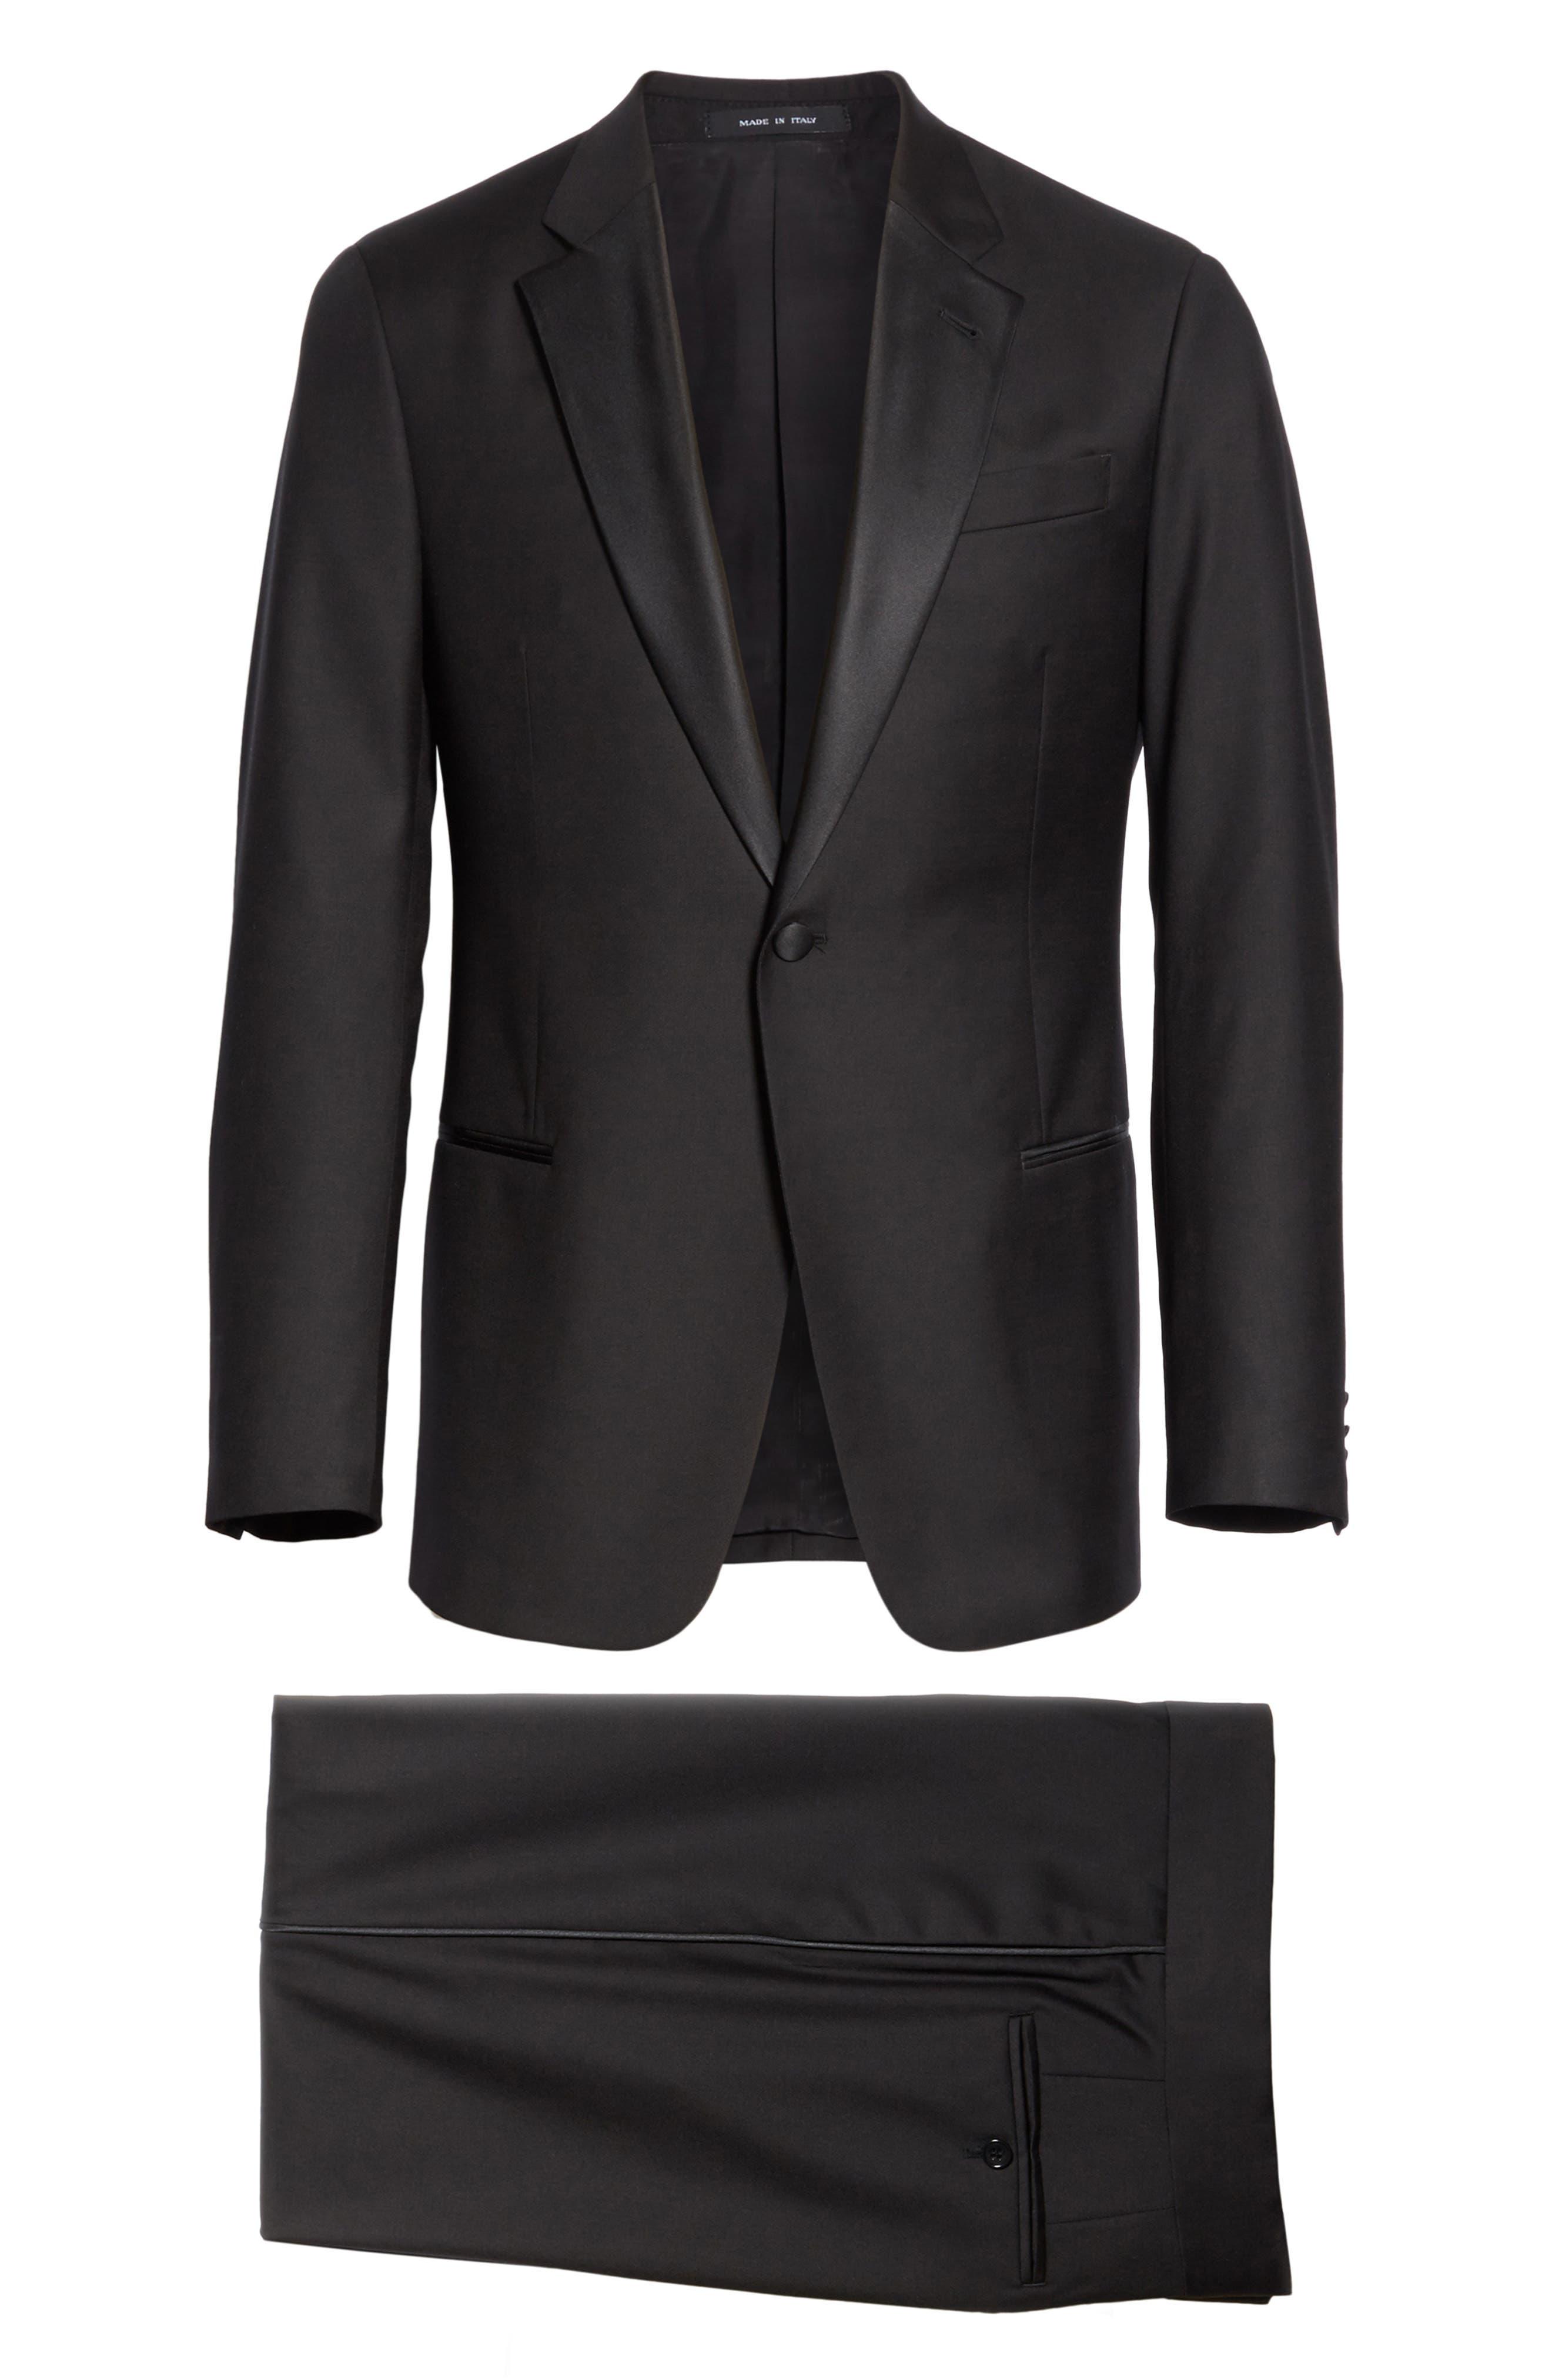 EMPORIO ARMANI, Trim Fit Wool Tuxedo, Alternate thumbnail 8, color, BLACK